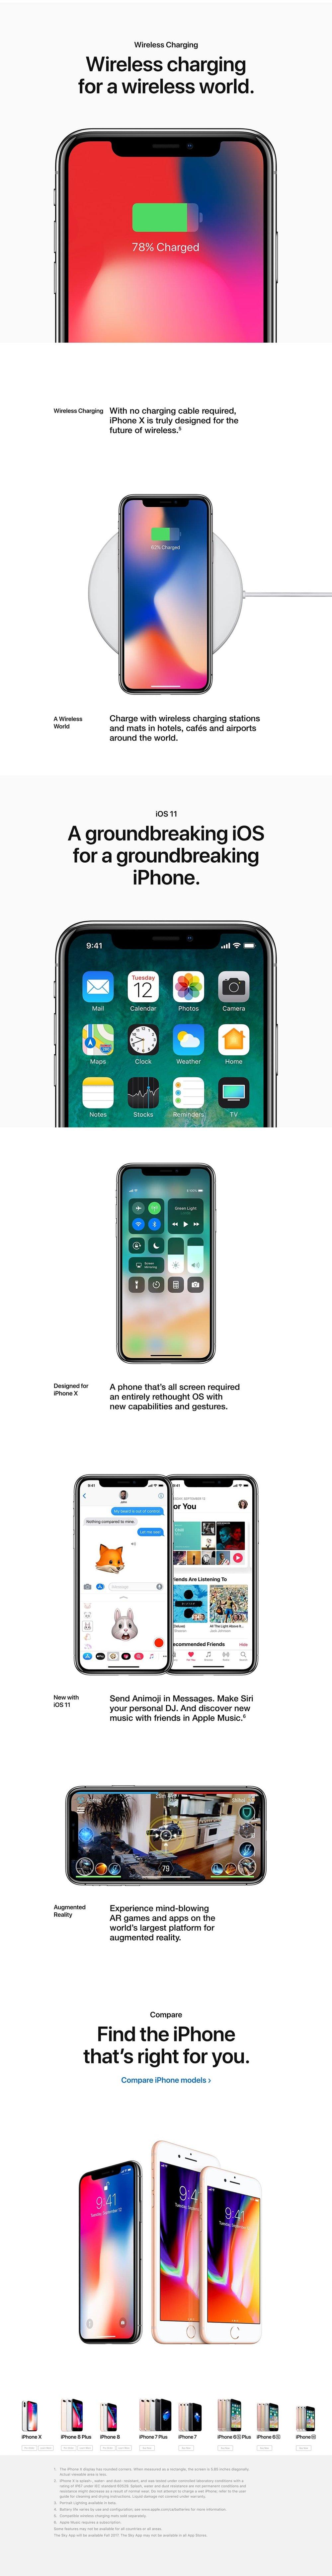 apple-iphone-x-4-river.jpeg